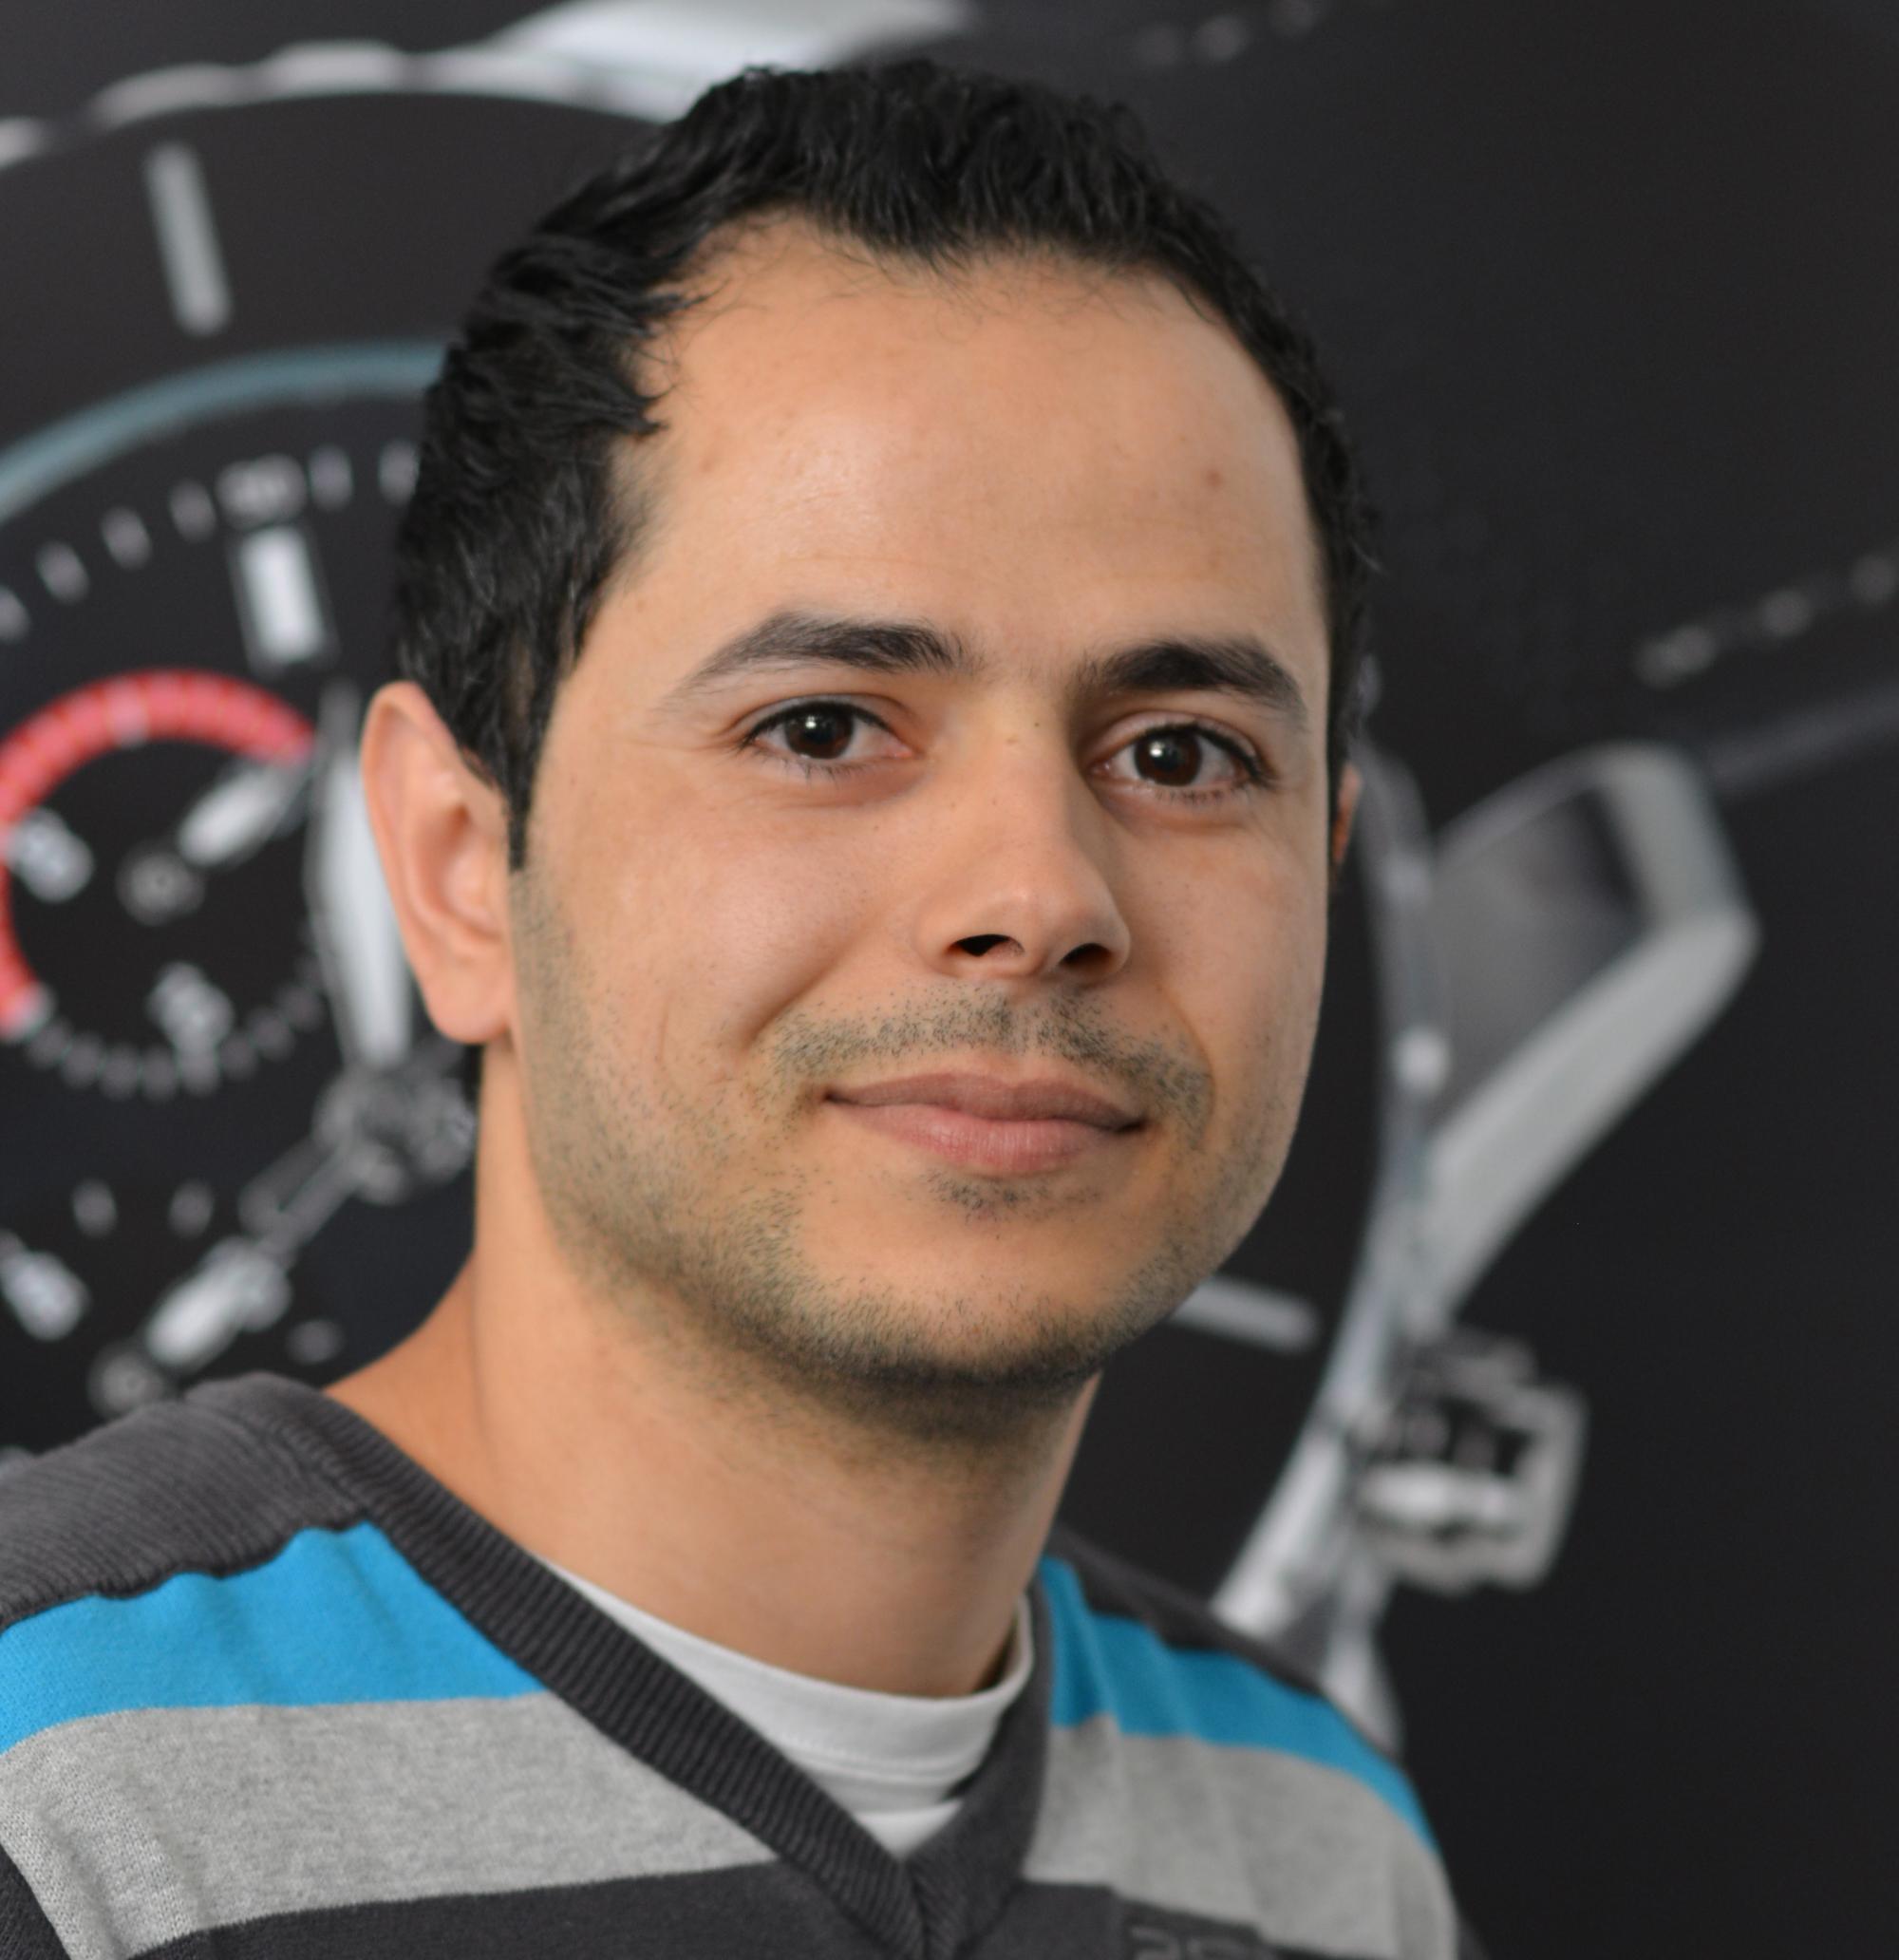 Ahmed Rabbech